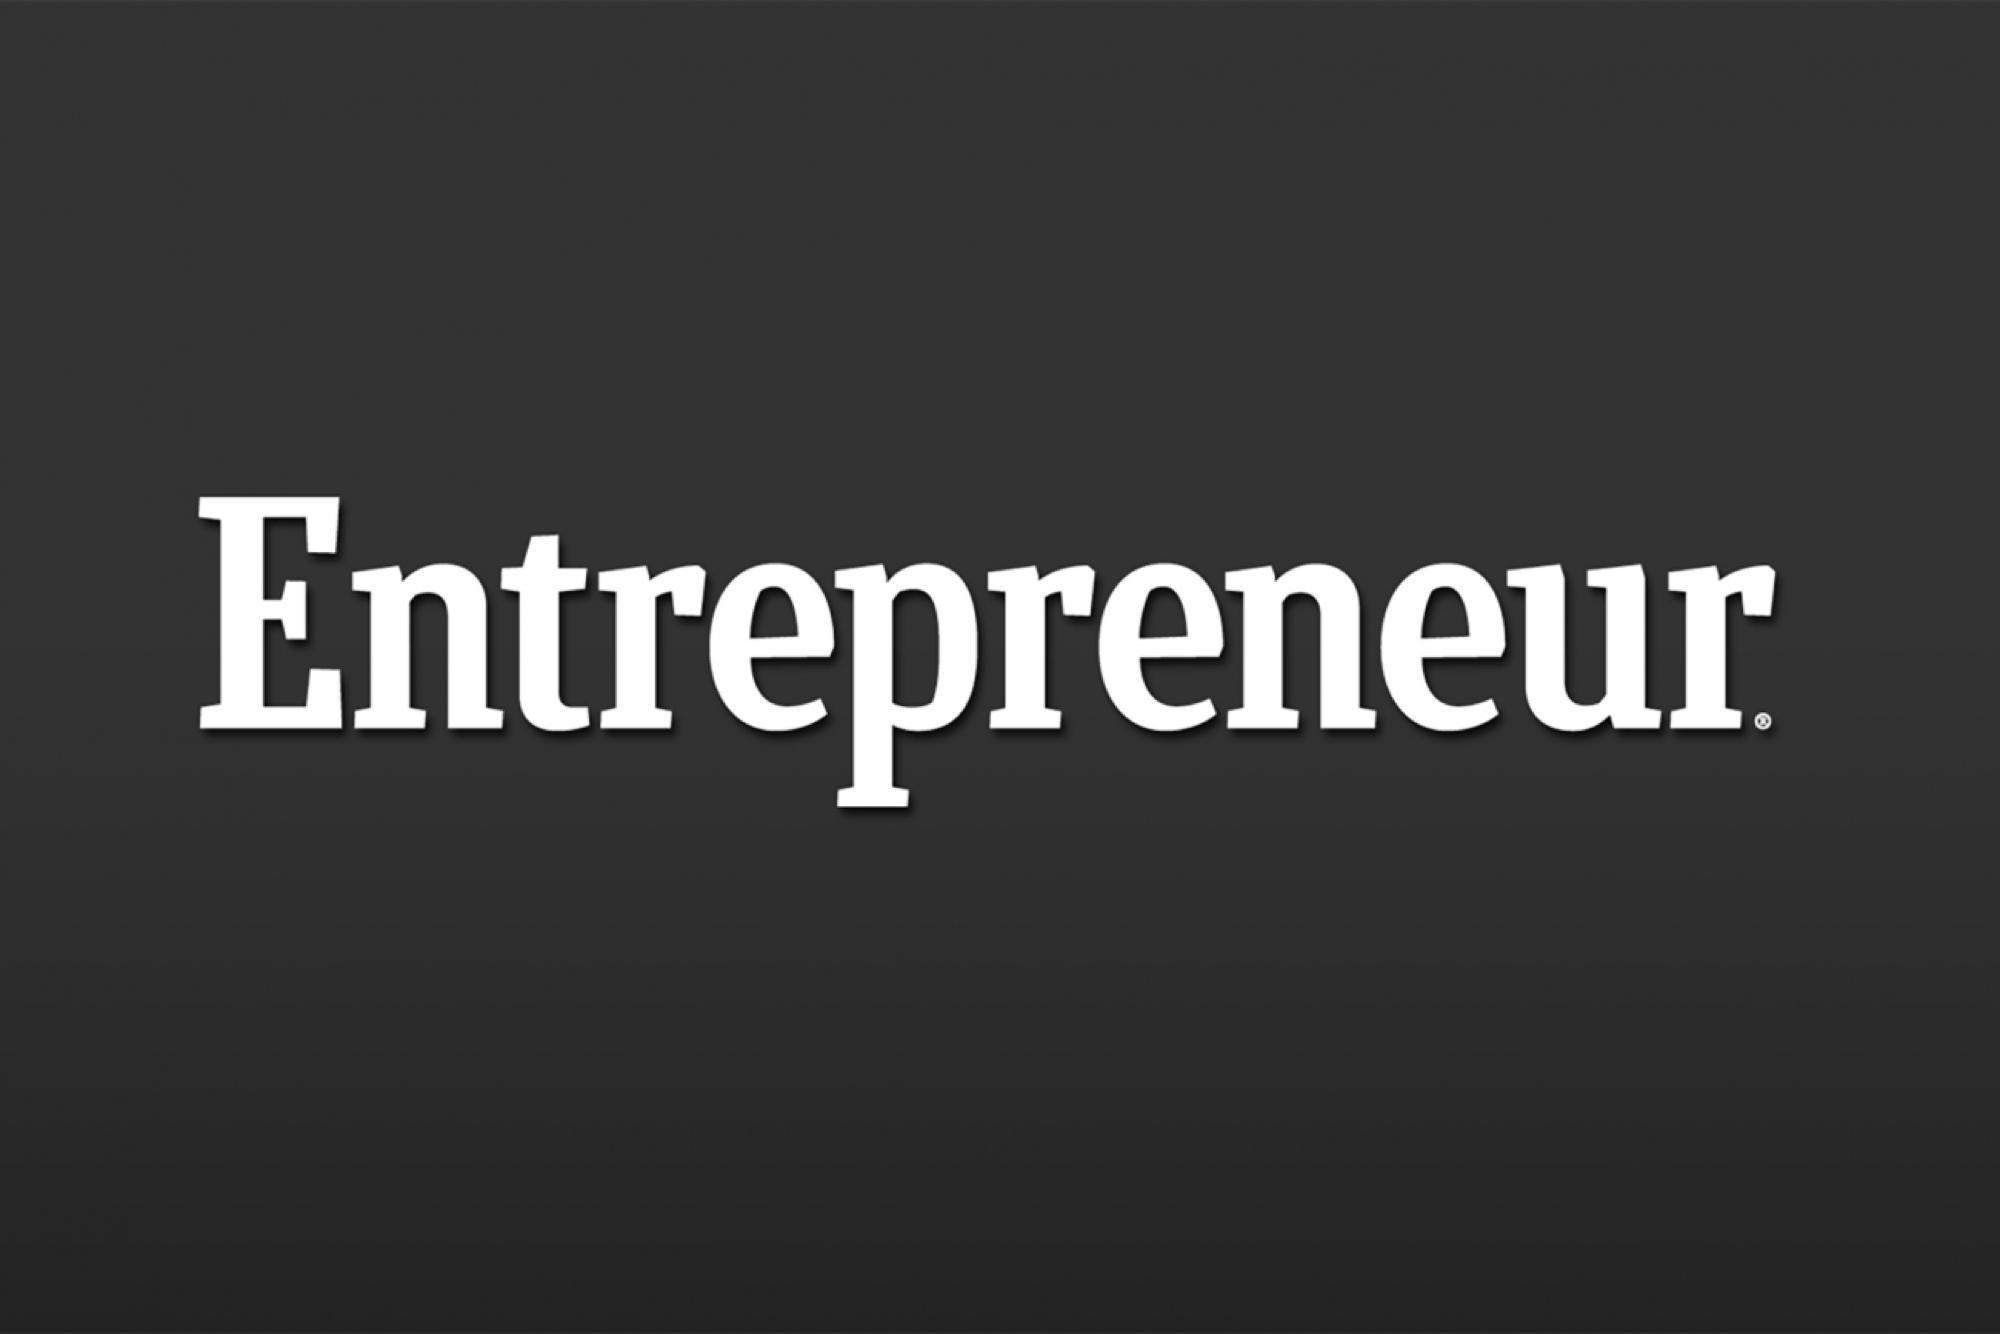 Invitations & Stationery--Starting A Stationery Business--Entrepreneur.com